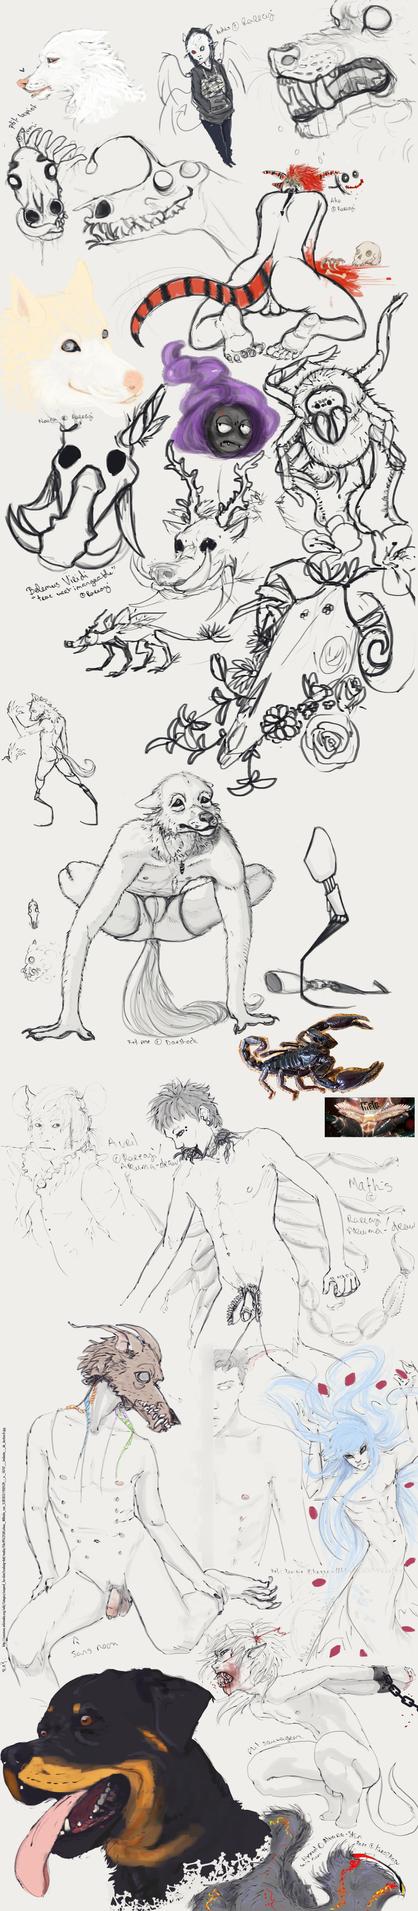 Sketch dump by Akuma-draw